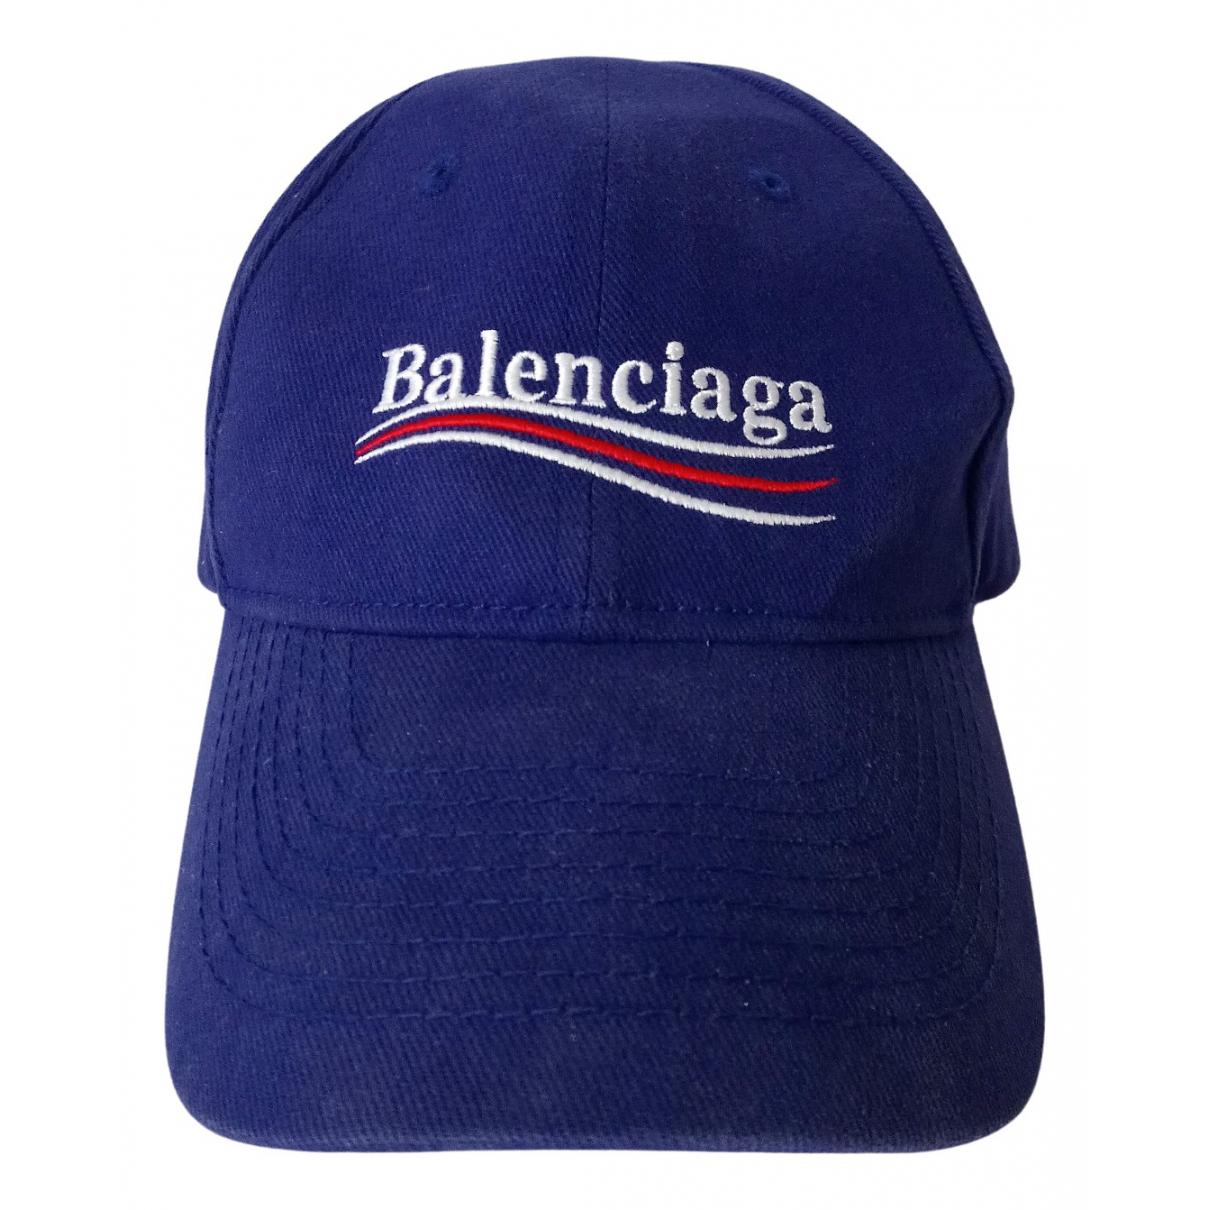 Balenciaga \N Hut, Muetzen in  Blau Baumwolle